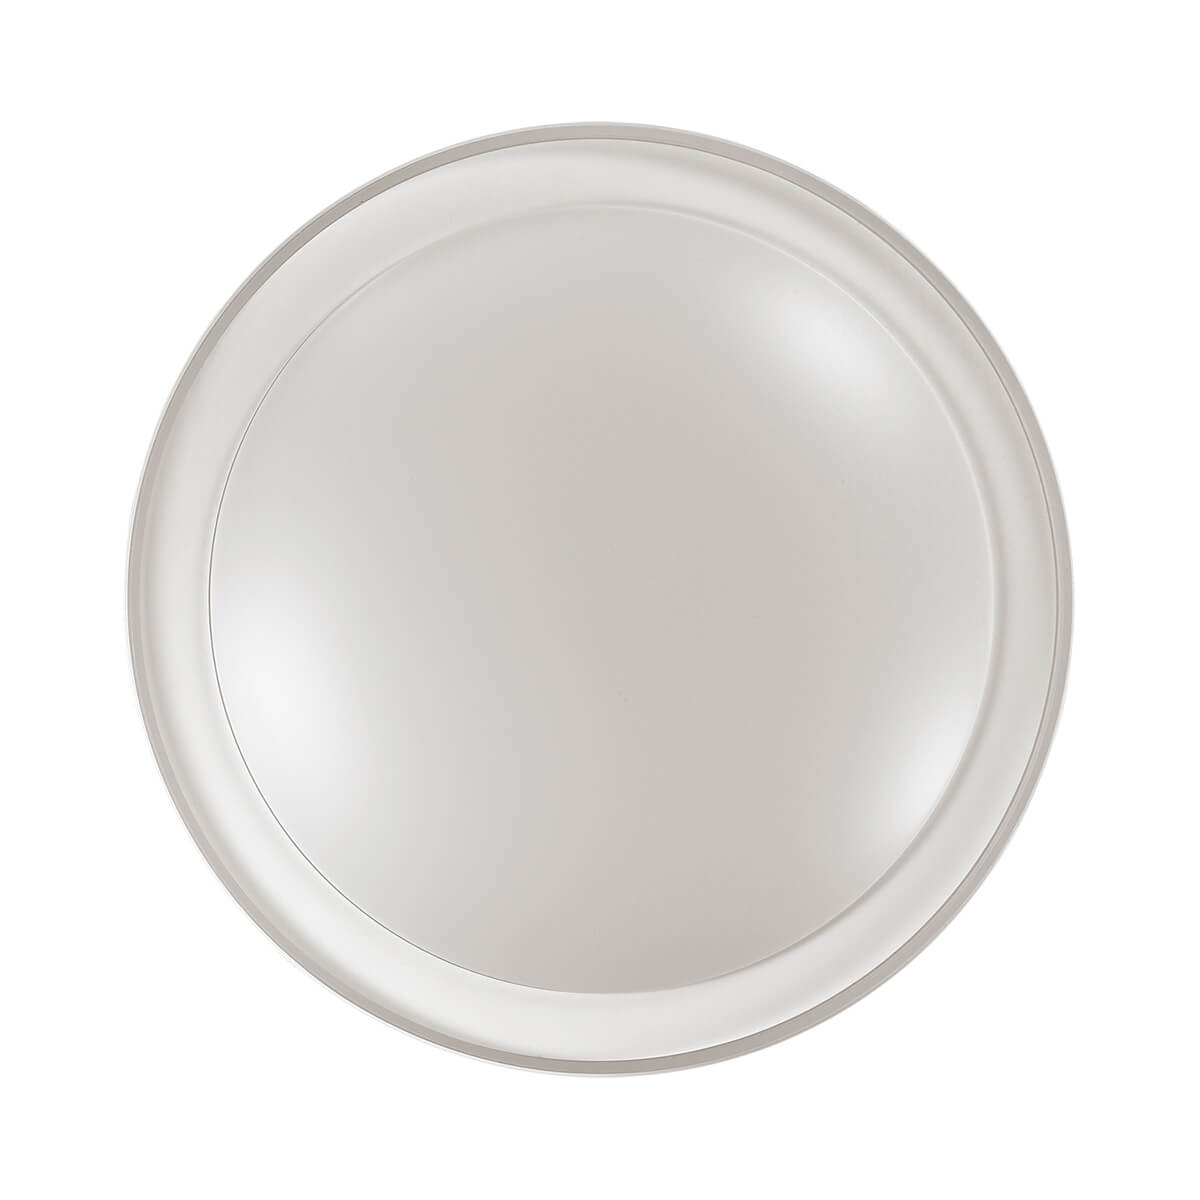 Светильник Sonex 2049/EL накладной светильник 146 sonex